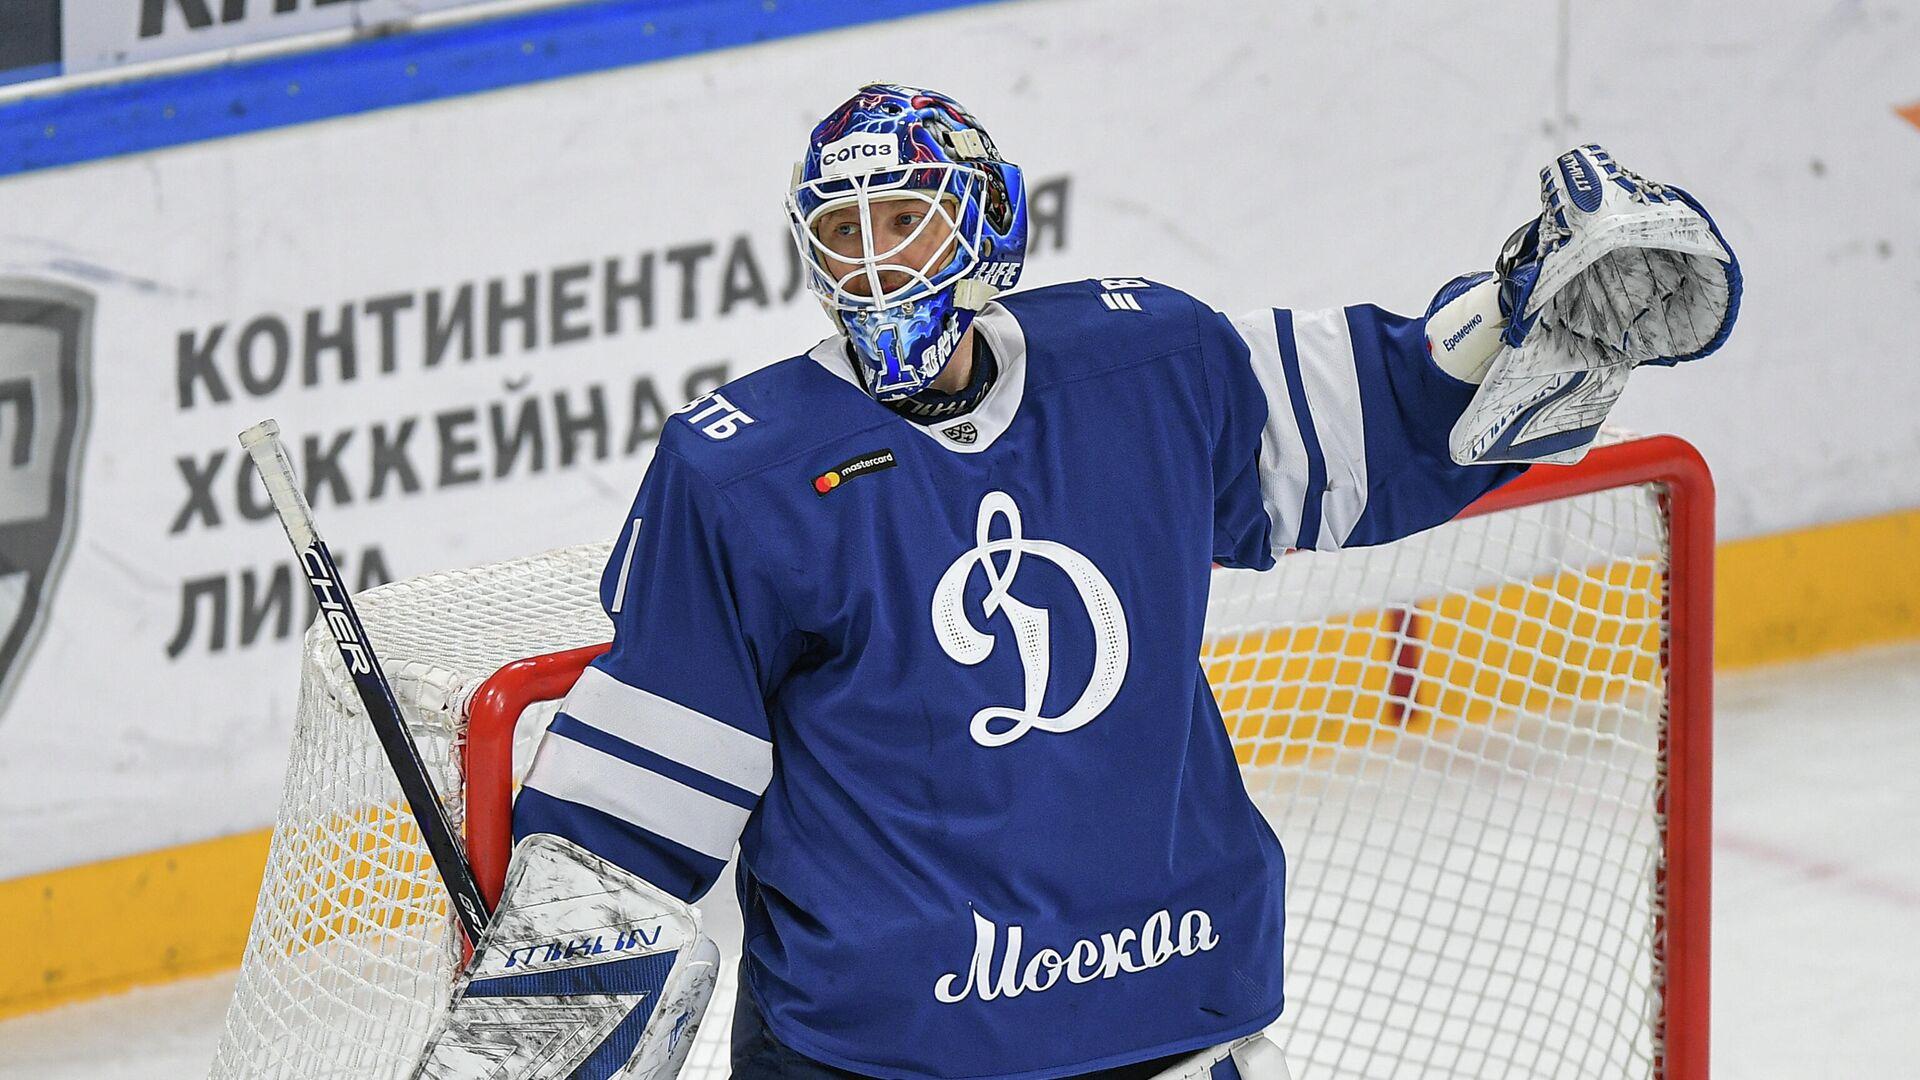 Вратарь Динамо Александр Еременко - РИА Новости, 1920, 13.04.2021